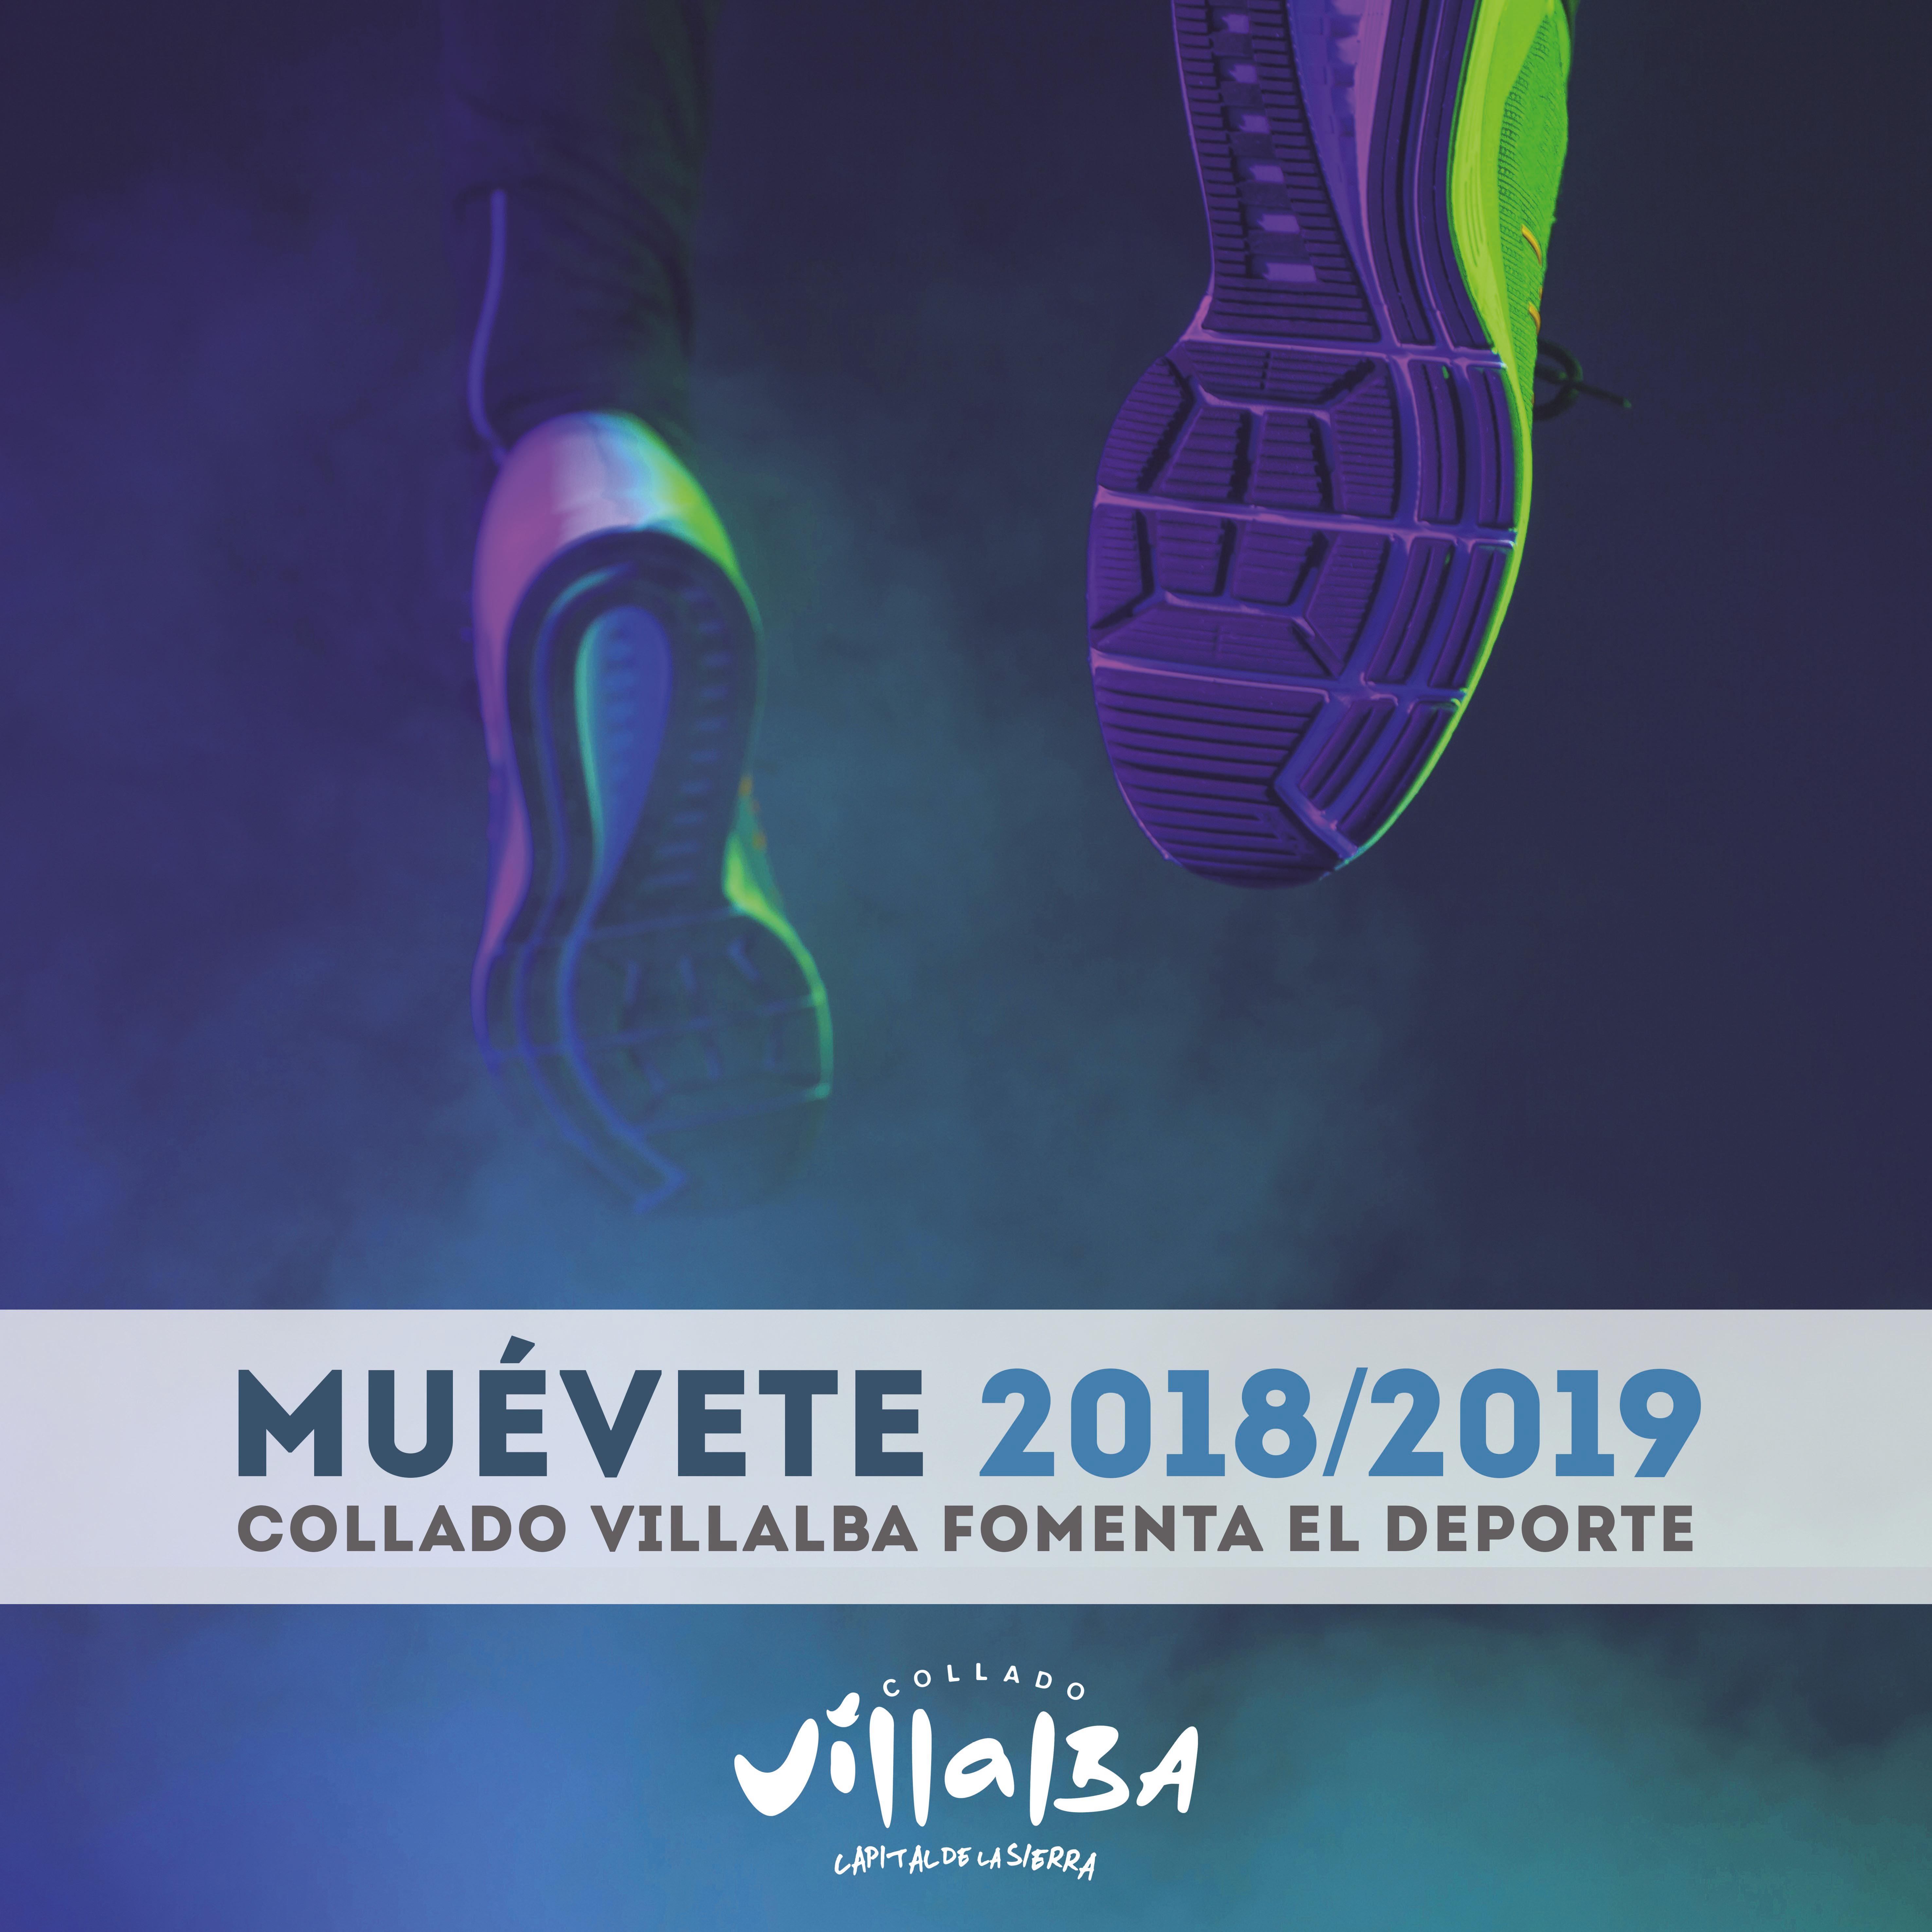 muevete-1